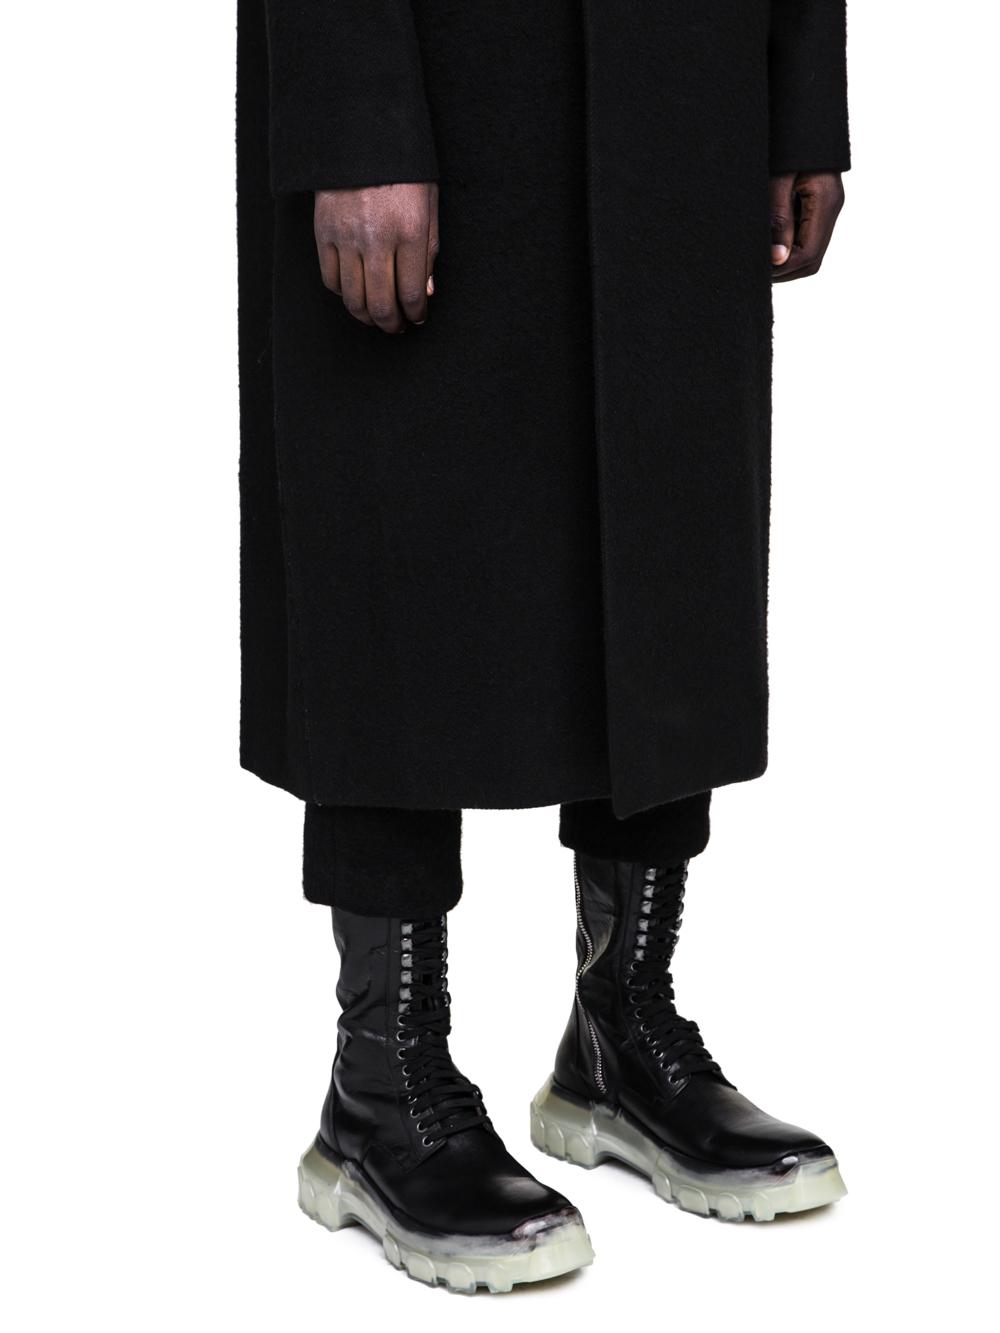 RICK OWENS FW18 SISYPHUS OFF-THE-RUNWAY BELL COAT IN BLACK CAMEL WOOL